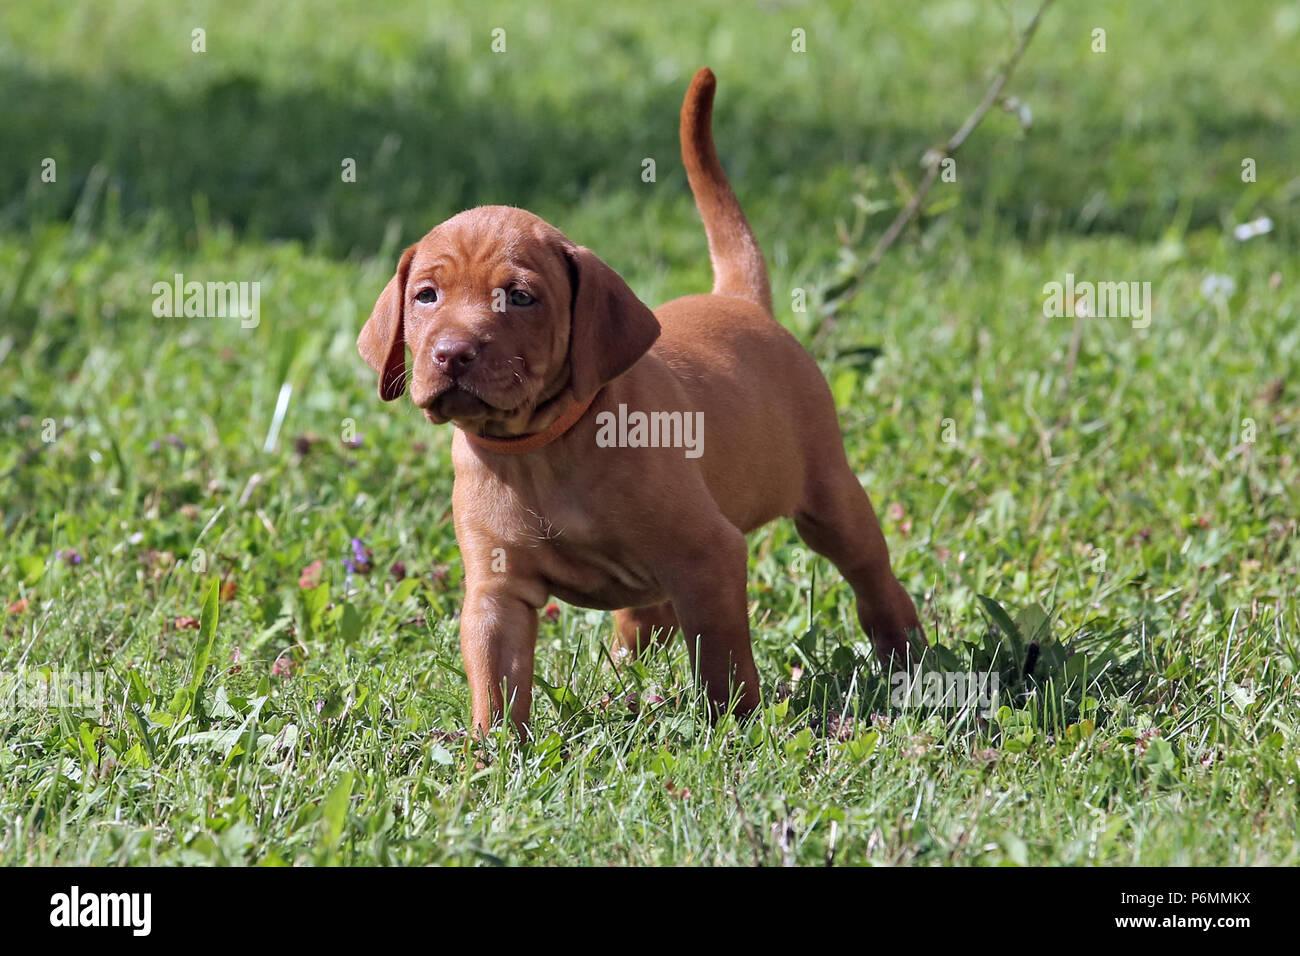 Neuenhagen, Germany, Magyar Vizsla Dog puppy - Stock Image